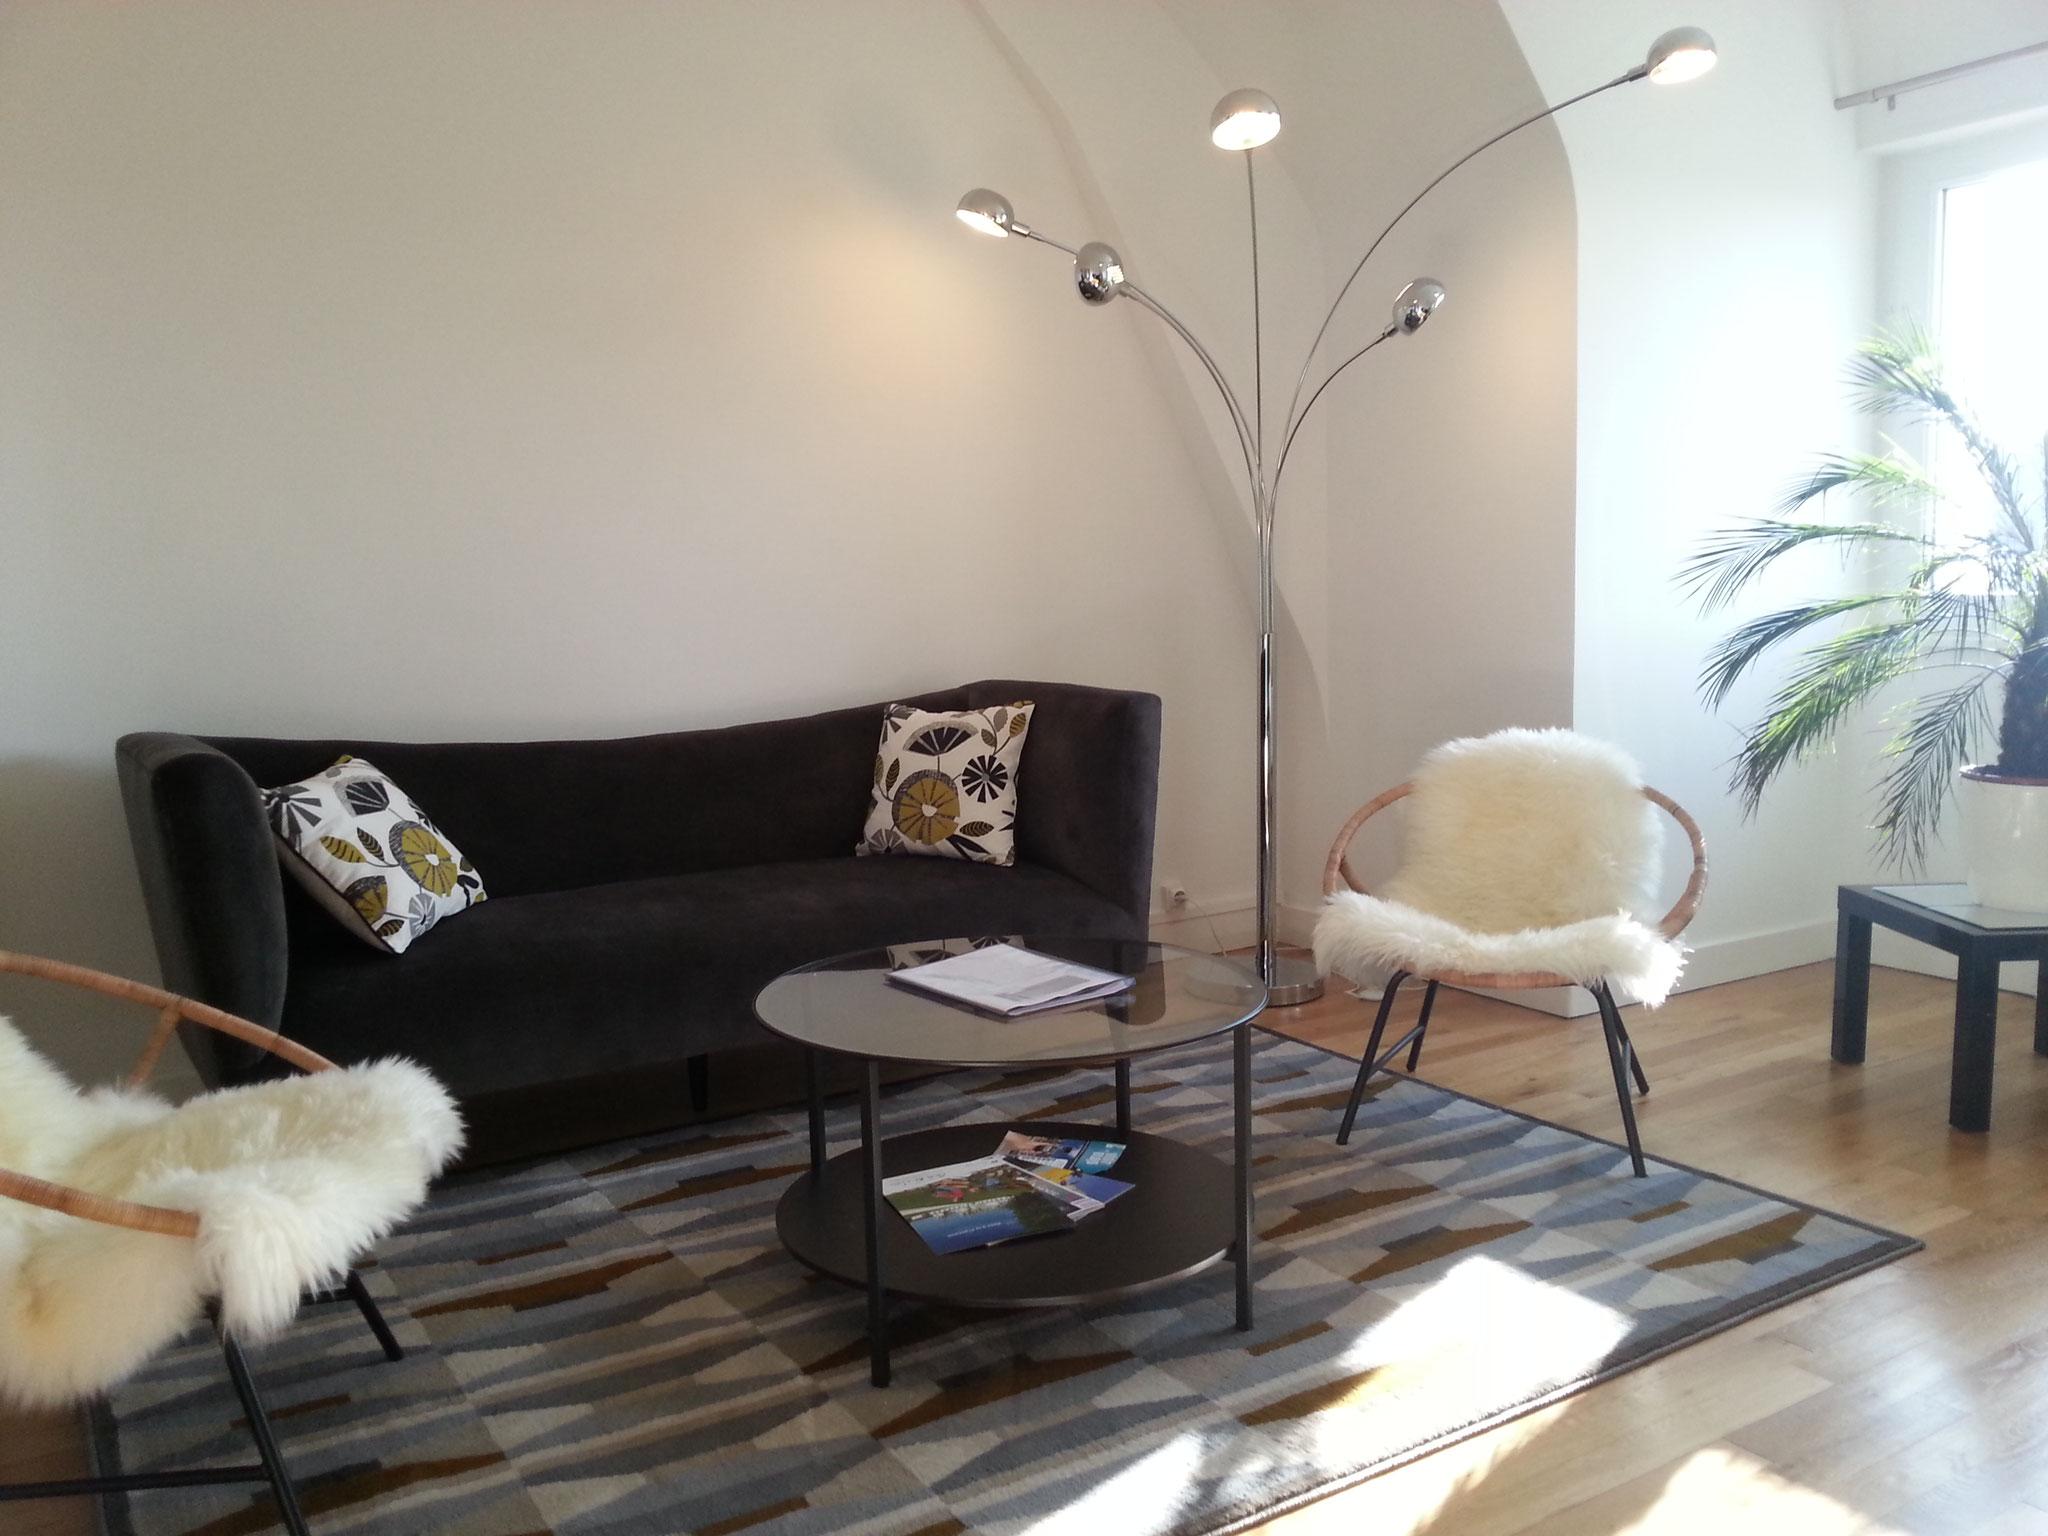 appart 39 blois la levraudiere cheverny chambres d 39 h tes table d 39 h tes. Black Bedroom Furniture Sets. Home Design Ideas